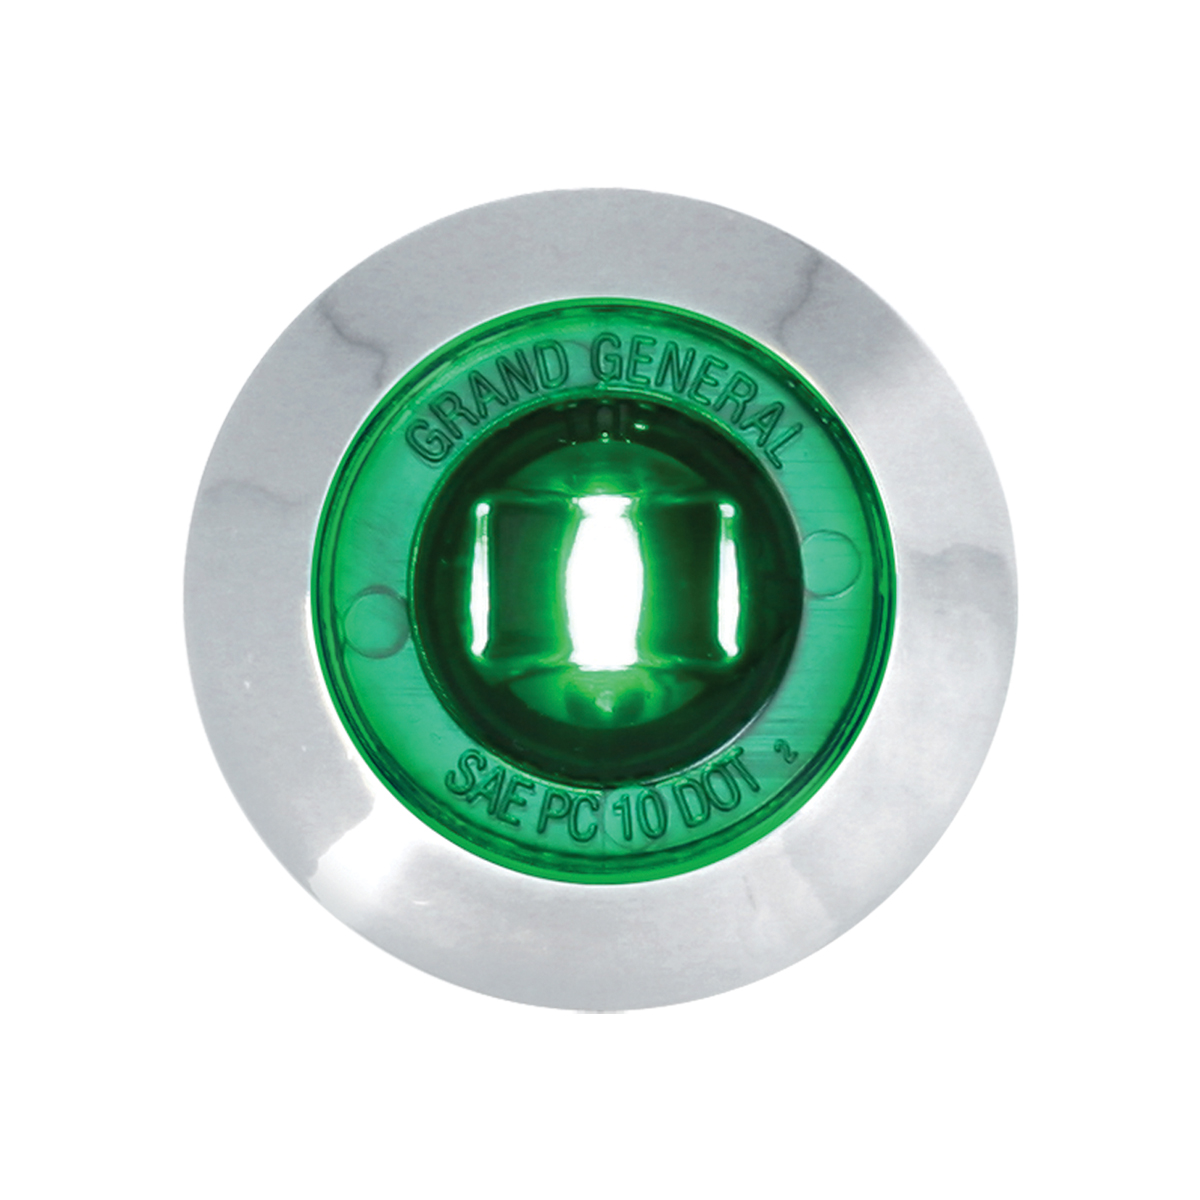 "75276 1"" Dual Function Mini Push/Screw-in Wide Angle LED Light w/ Chrome Bezel"